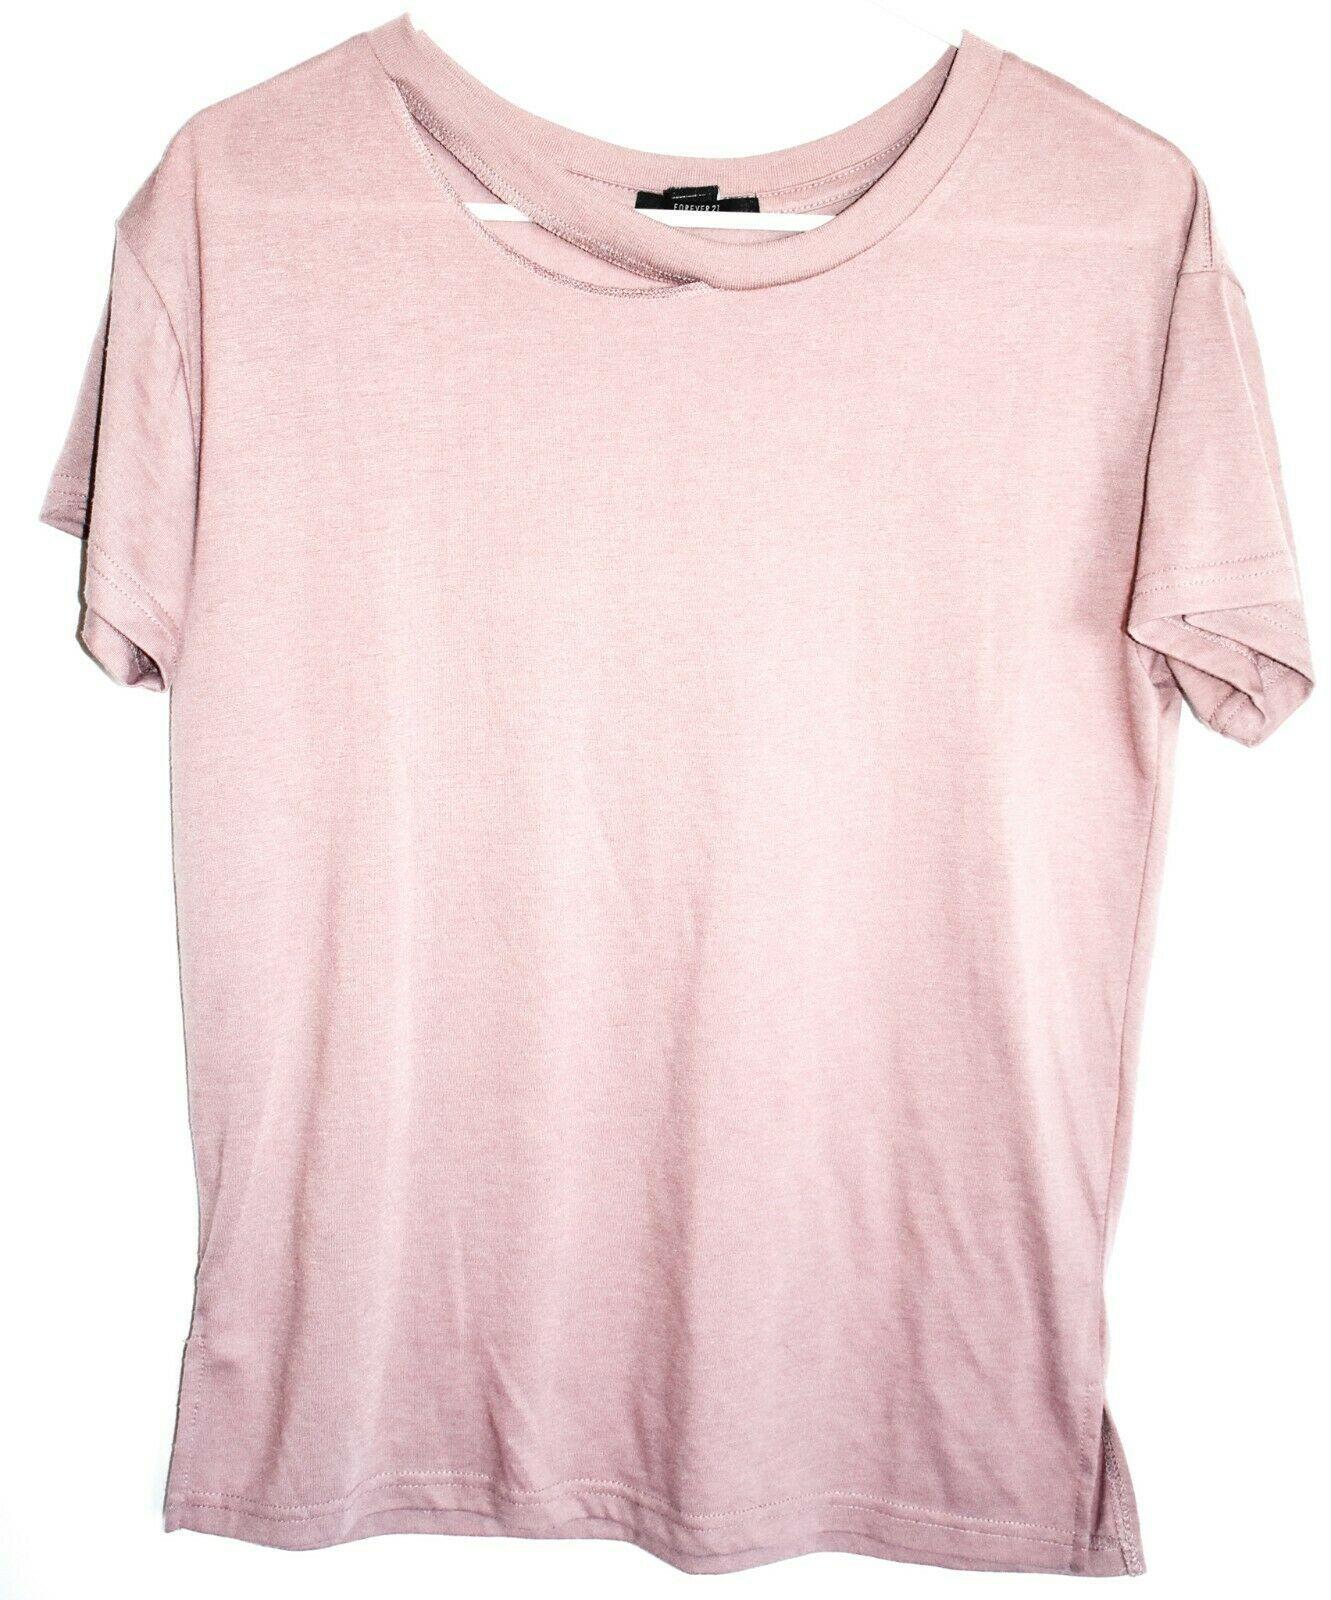 Forever 21 Mauve Purple Jersey Crew Neck T-Shirt Top Size S